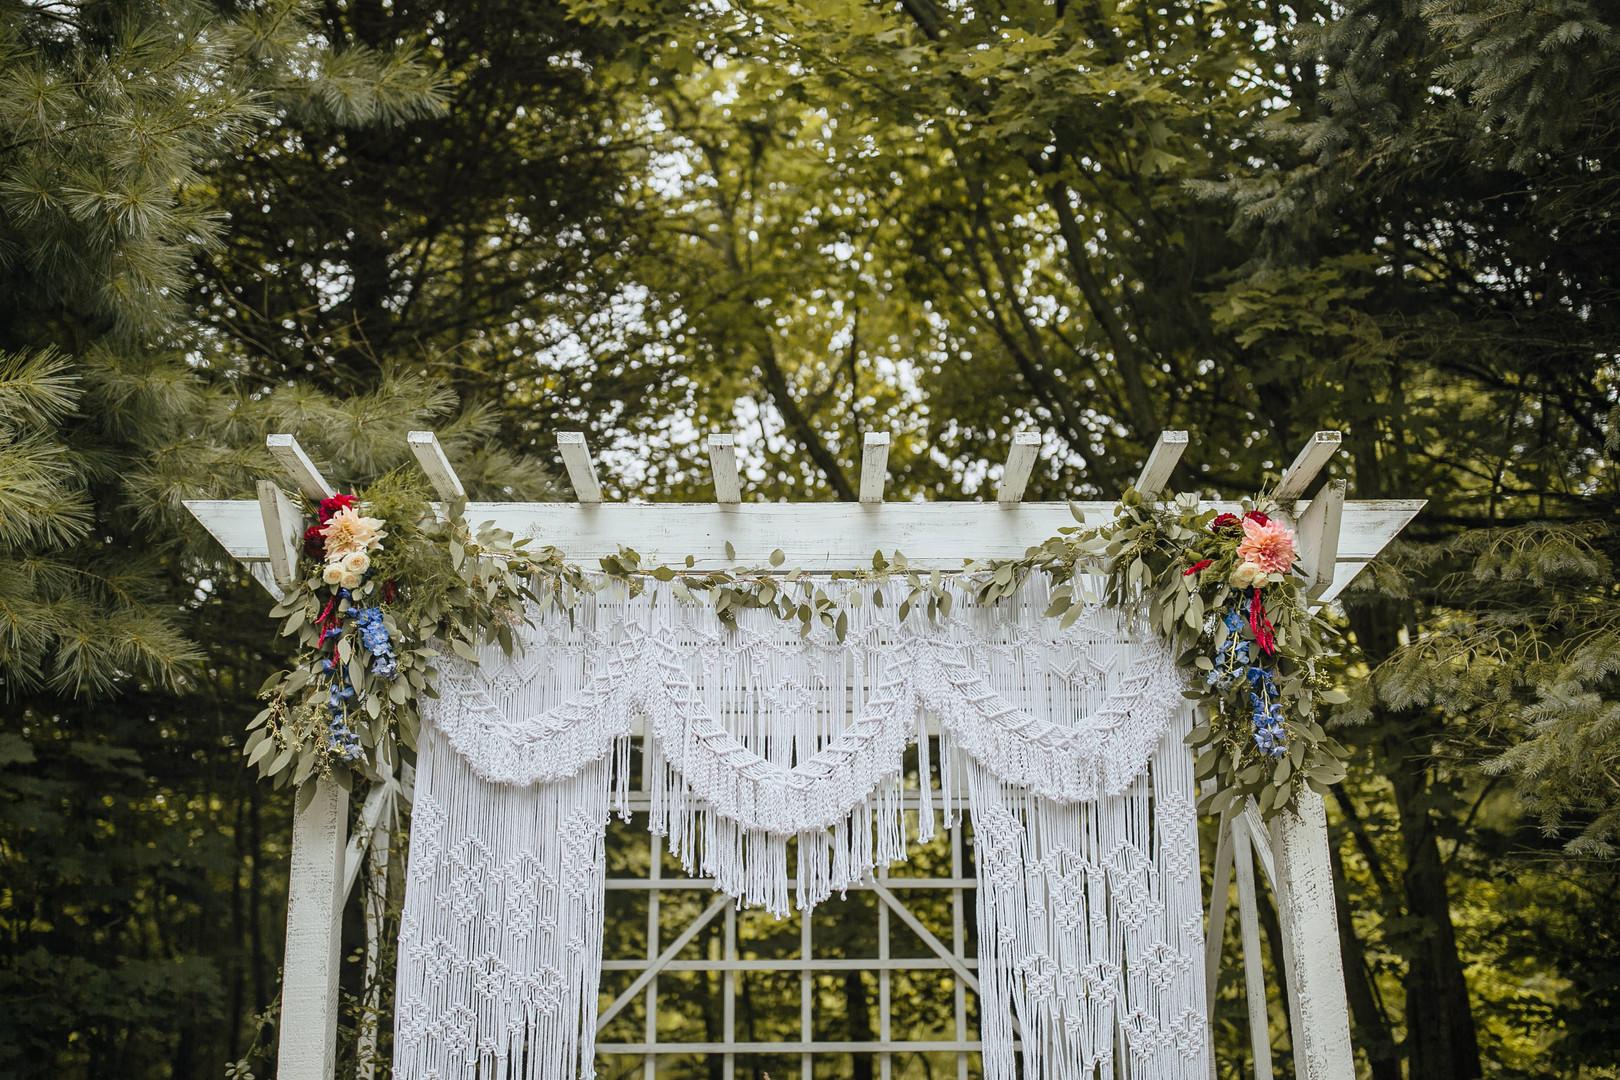 2019-9-Megan-Alex-Ceremony-MillCreek-Wil